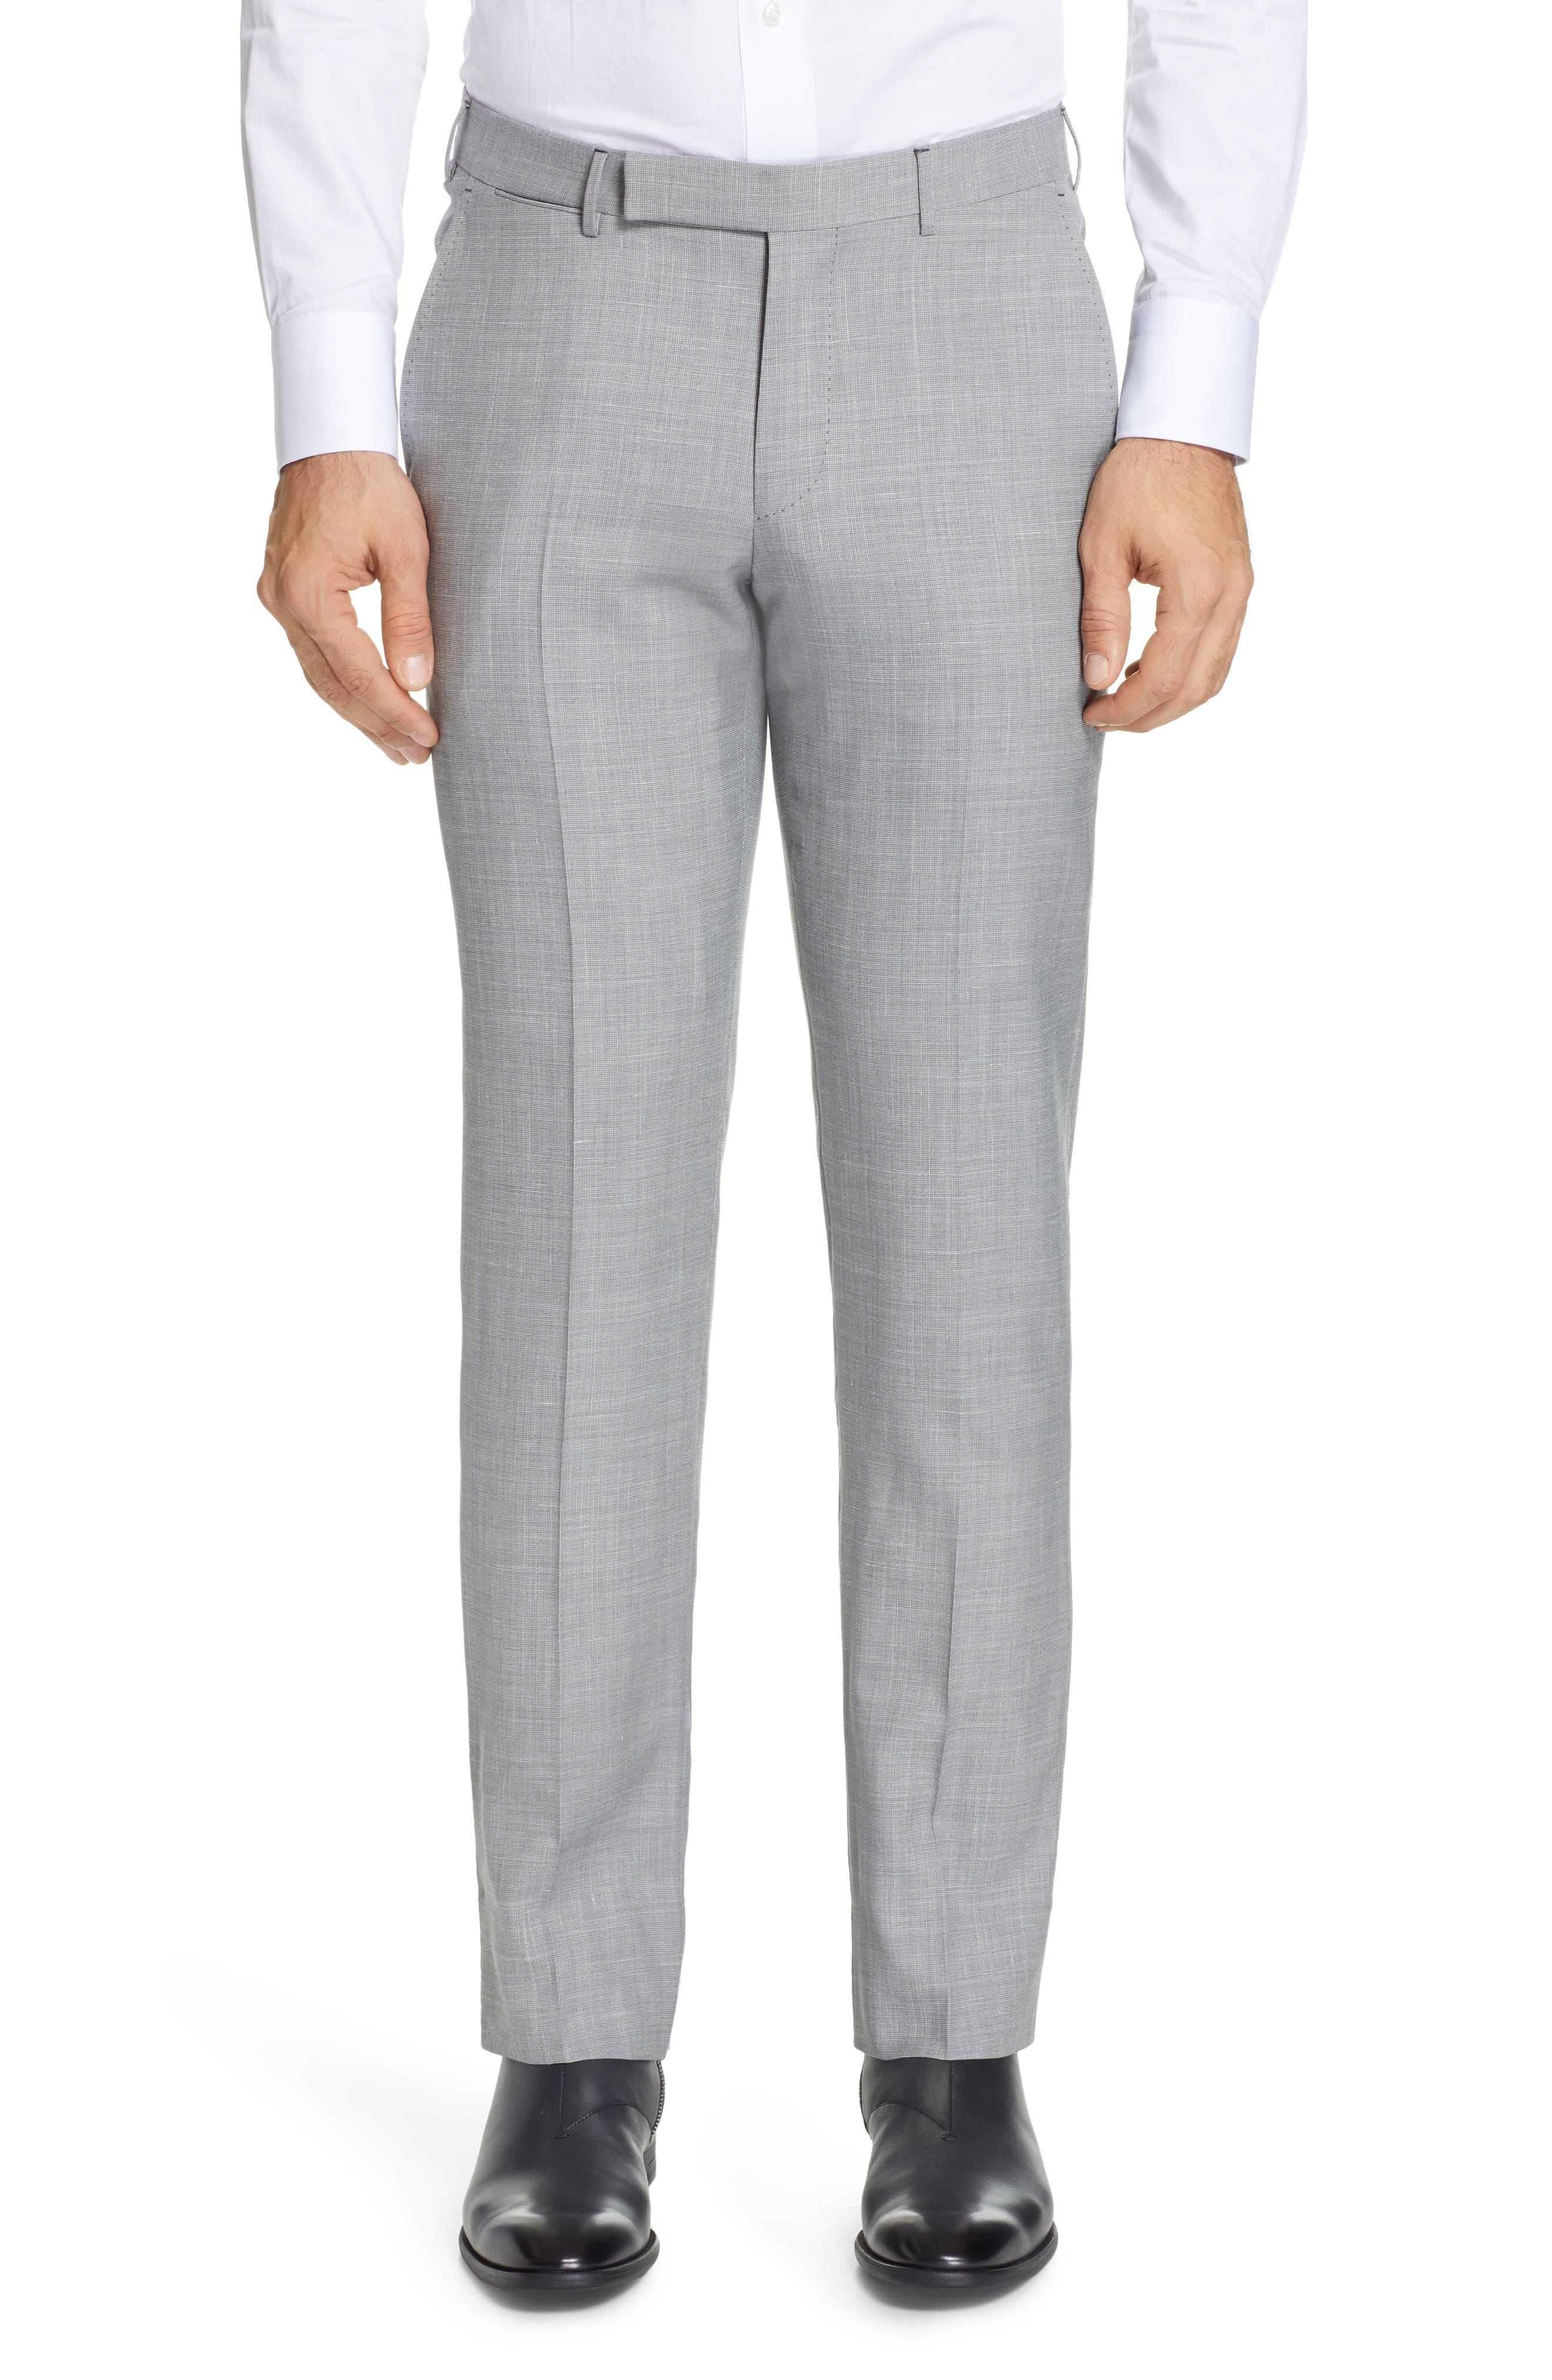 ERMENEGILDO ZEGNA, Trofeo Flat Front Solid Wool Blend Trousers, Main thumbnail 1, color, LIGHT GREY